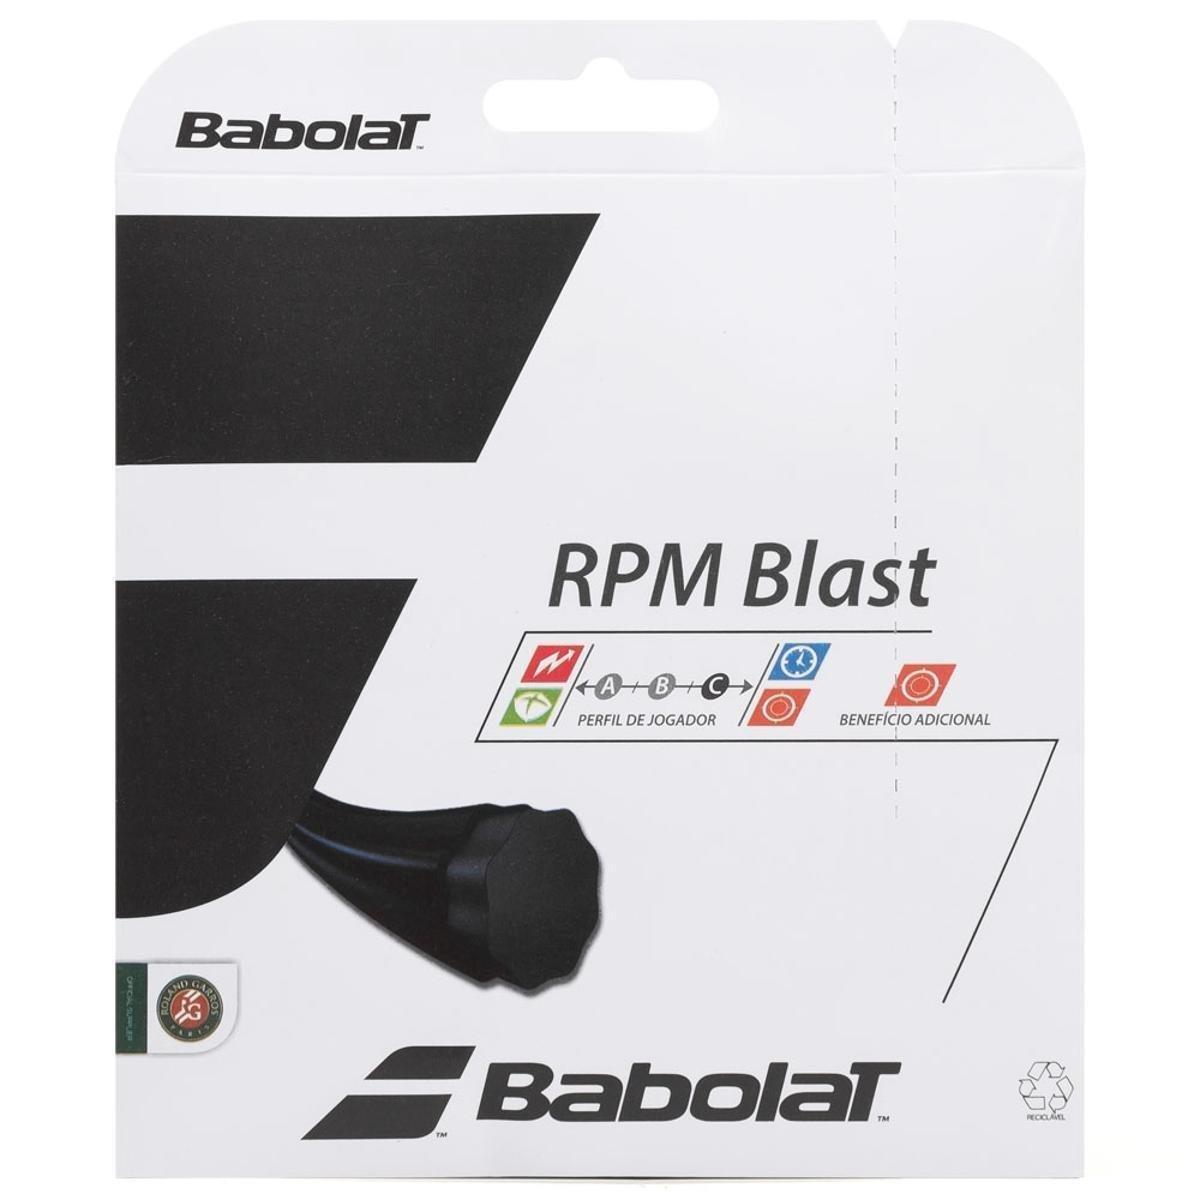 Corda Babolat RPM Blast 18L 1.20mm Preto - Set Individual